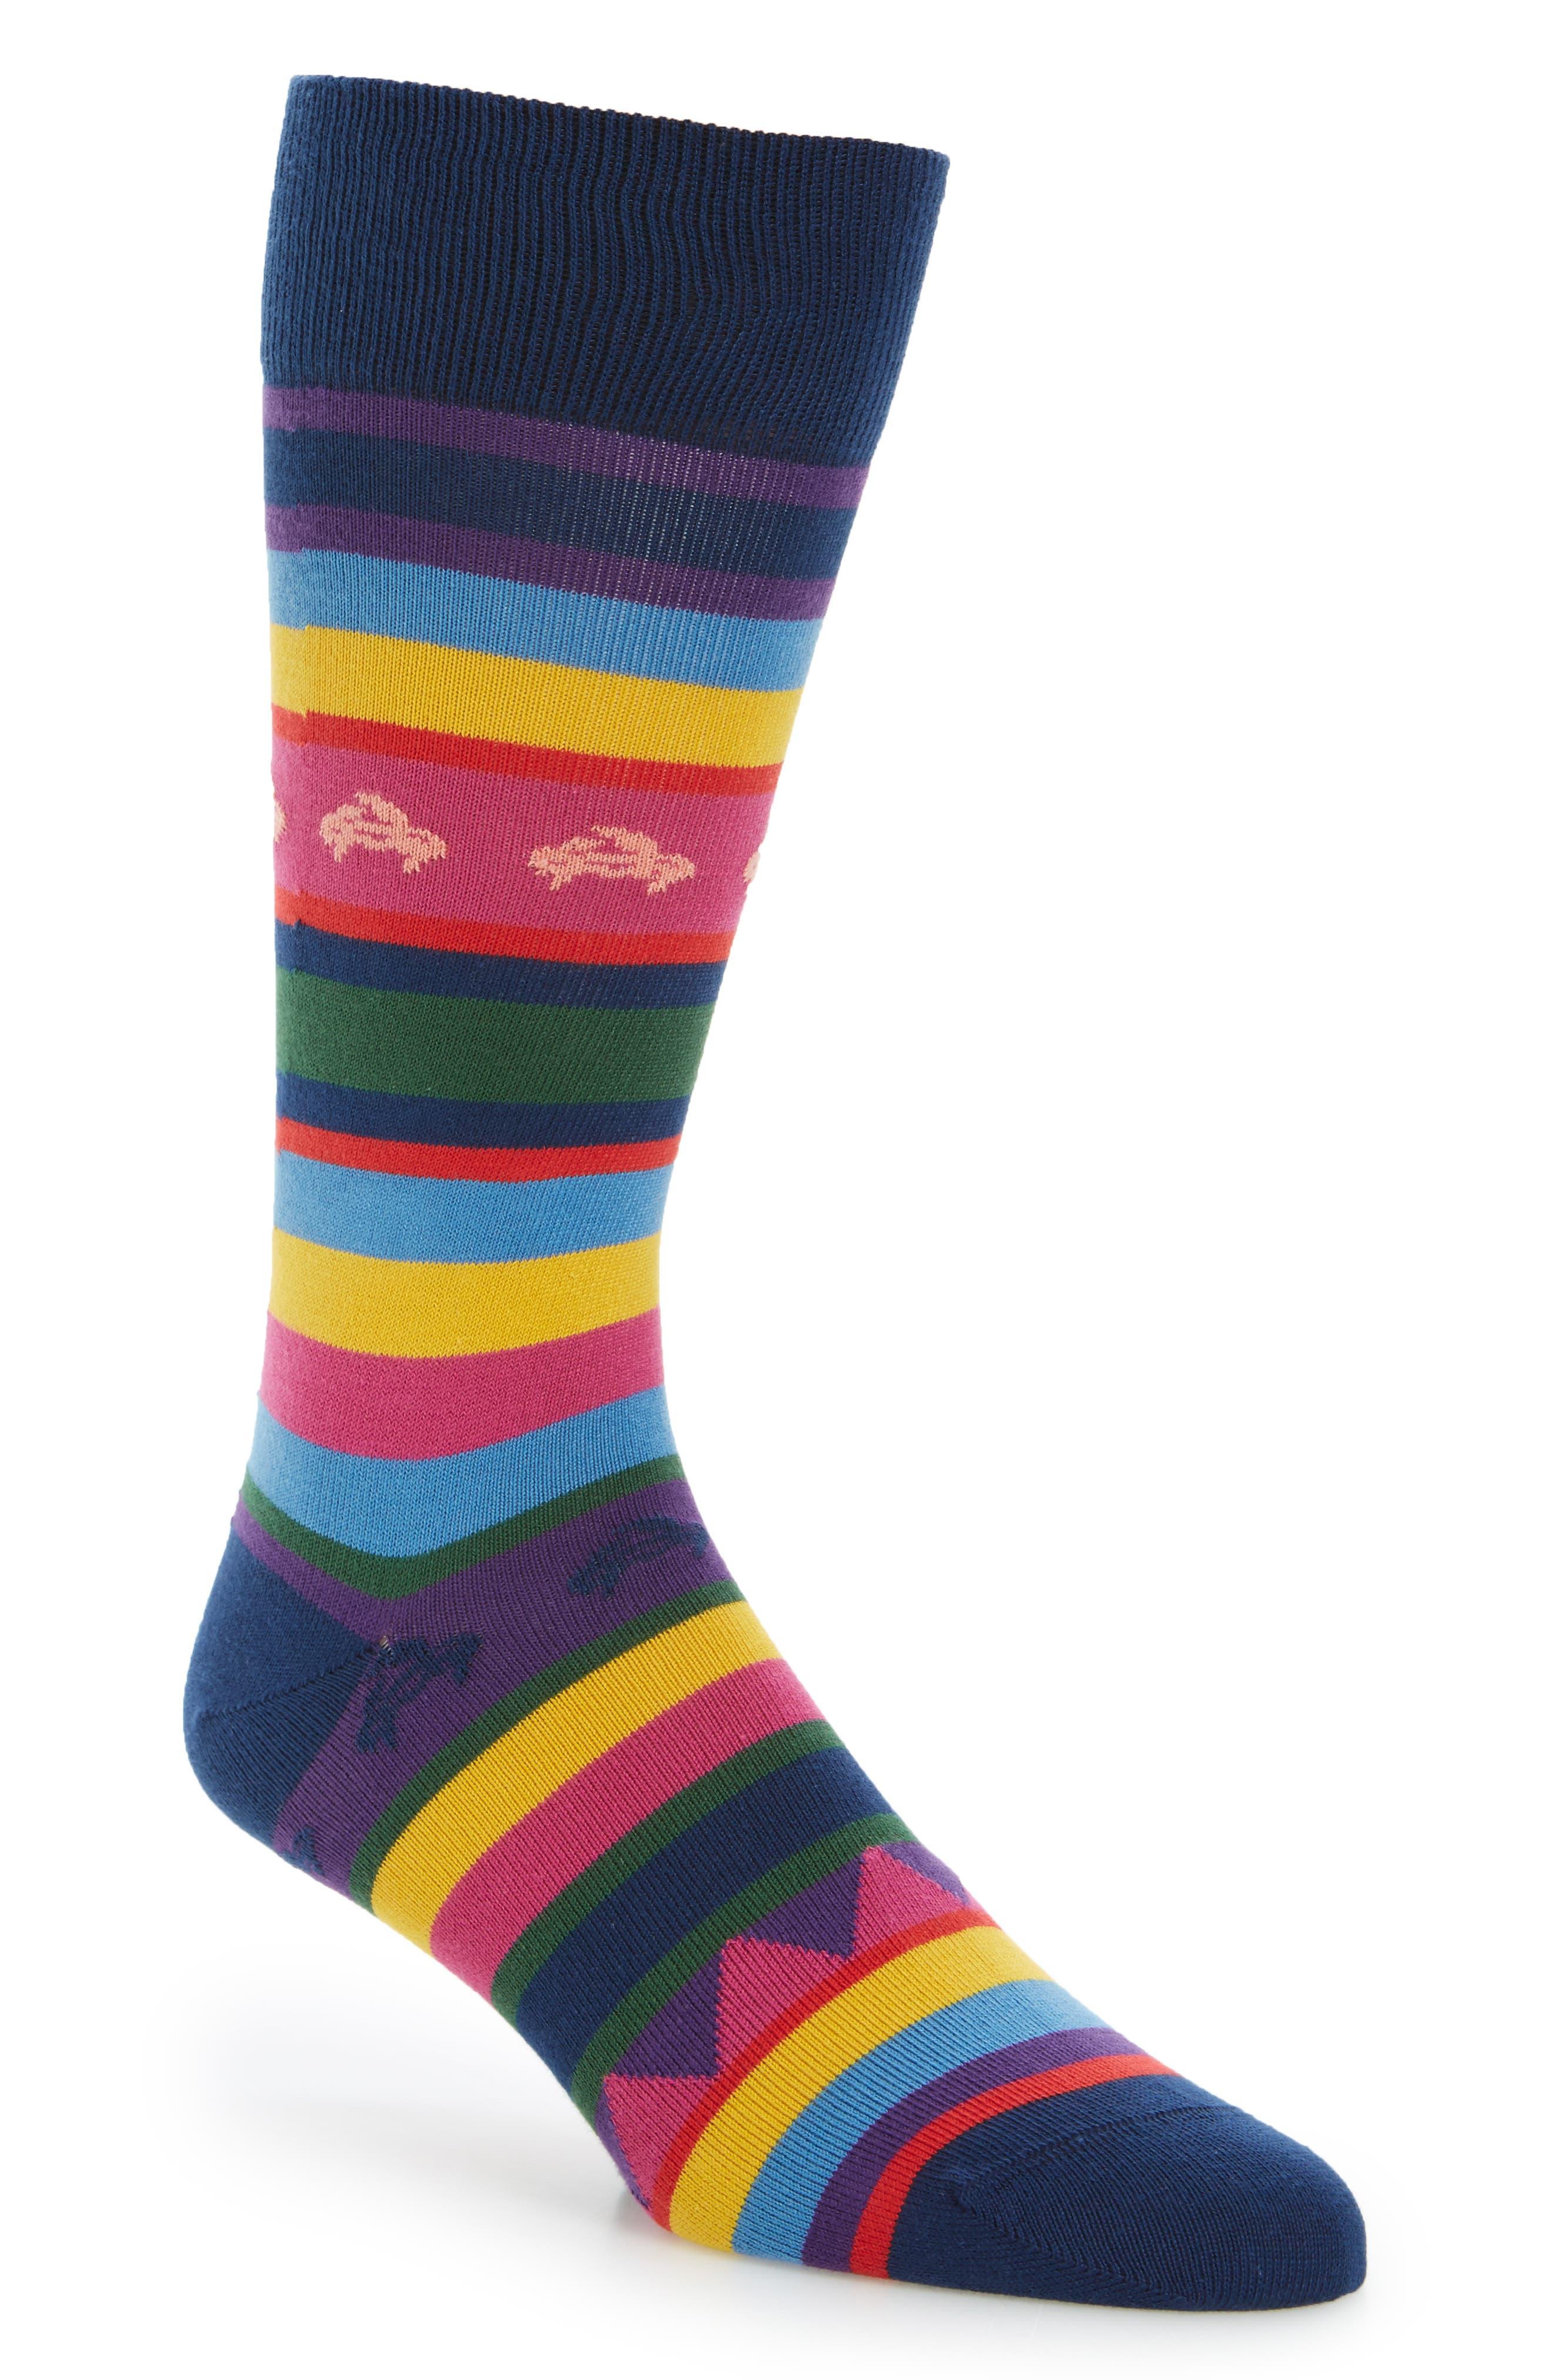 Crab Stripe Socks,                             Main thumbnail 1, color,                             415